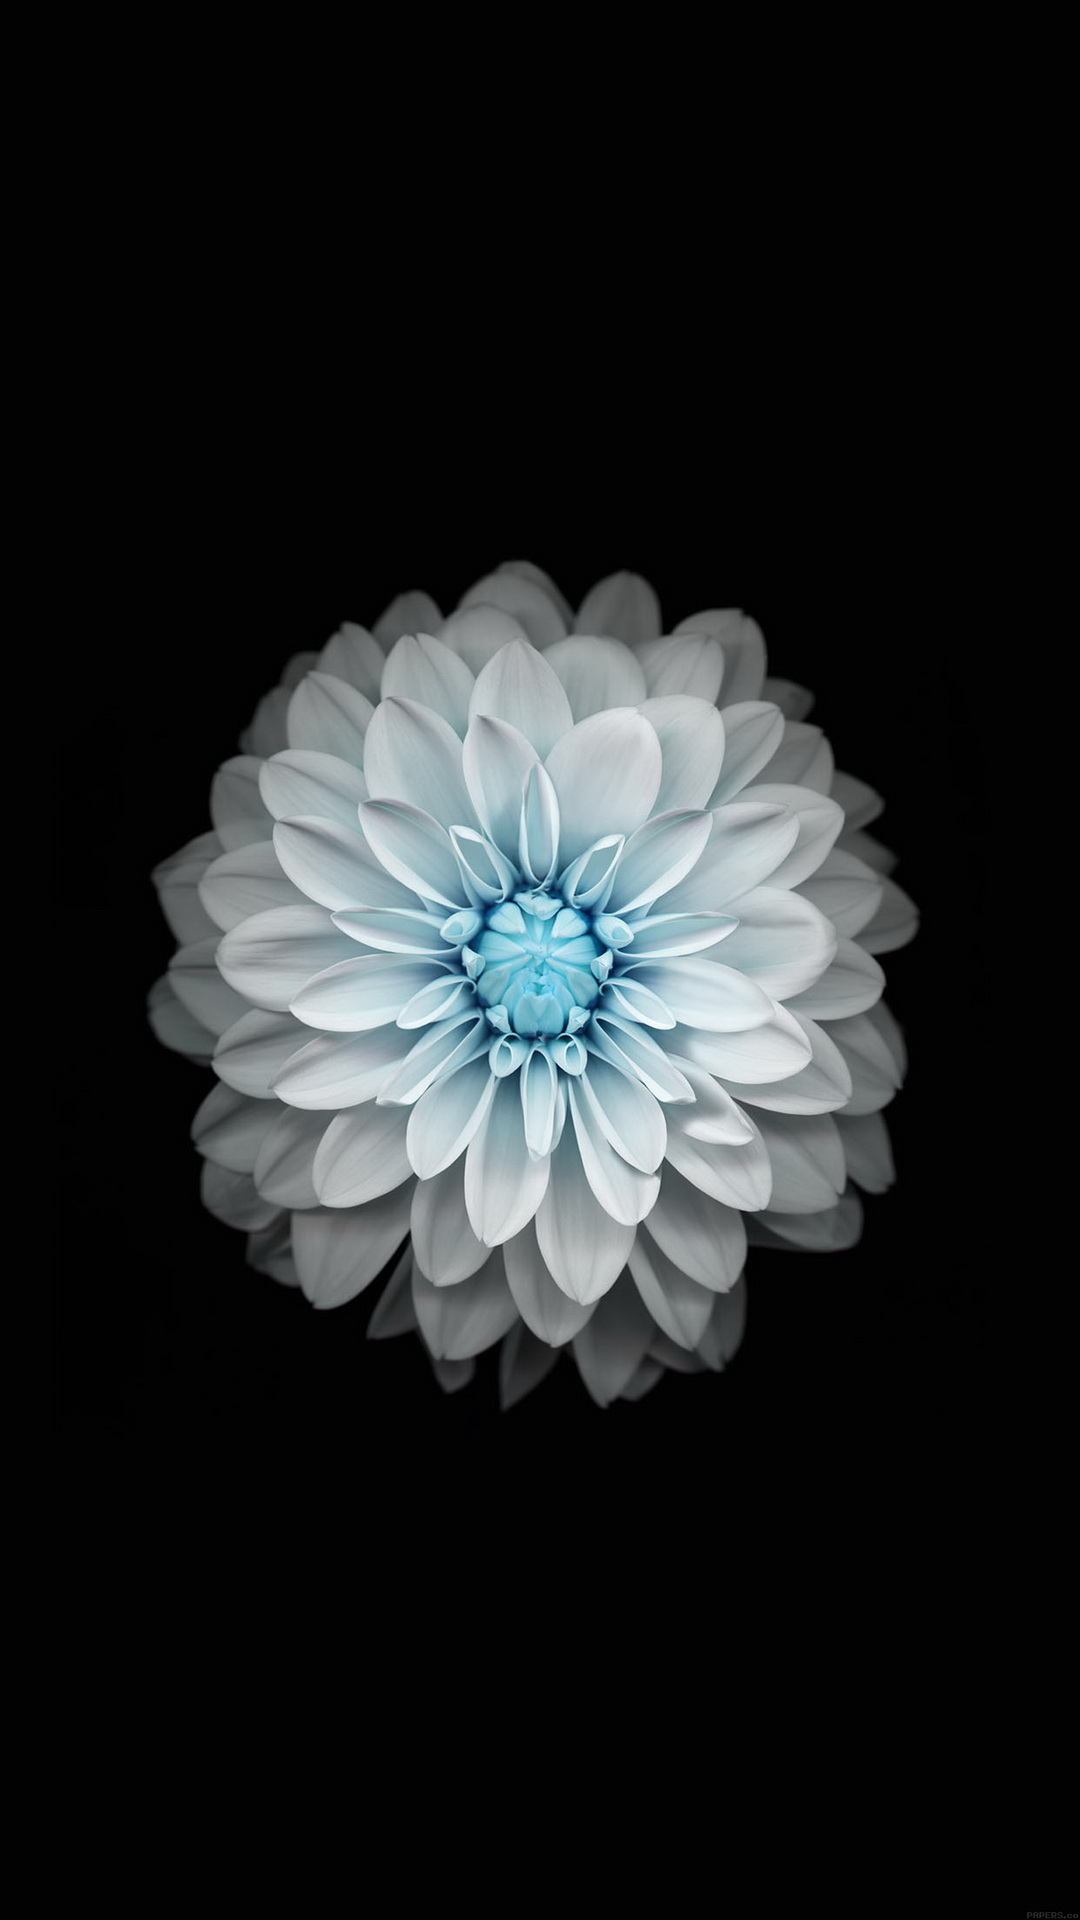 Blue-white-lotus-wallpaper-wp4604341